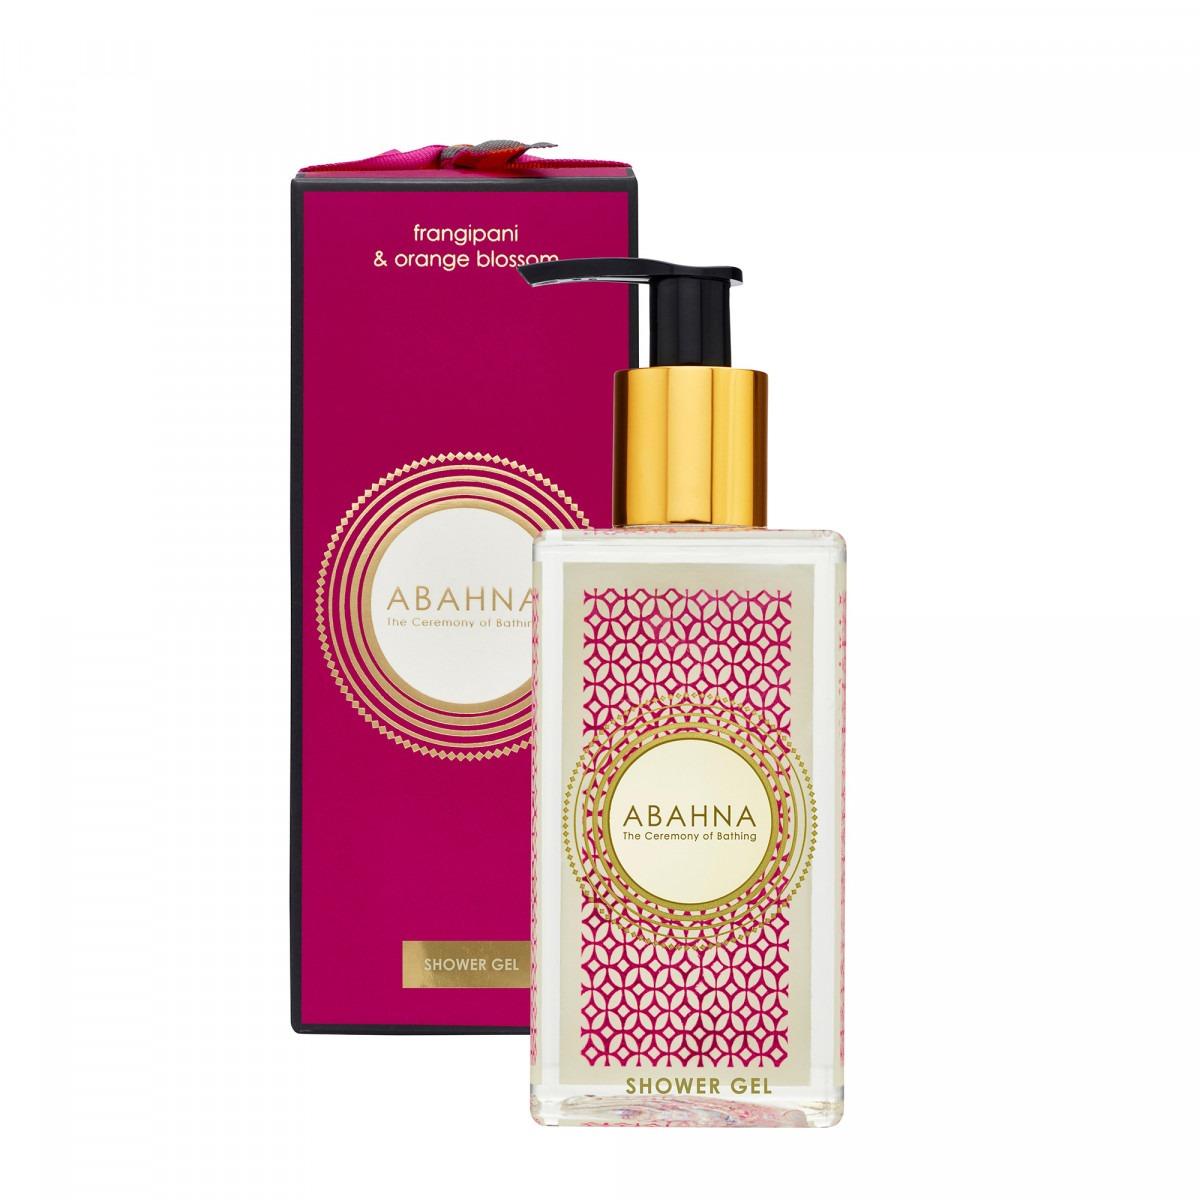 Abahna frangipani & orange blossom shower gel 250ml